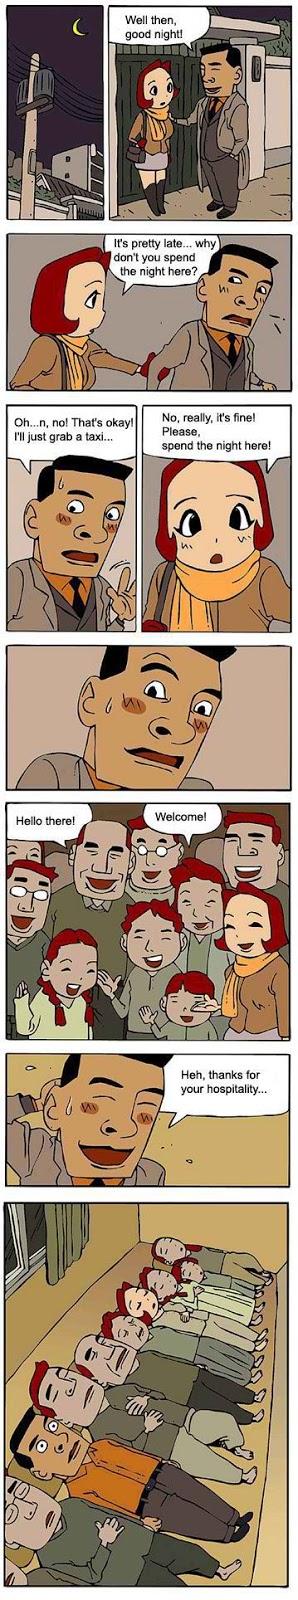 Korean comic strip